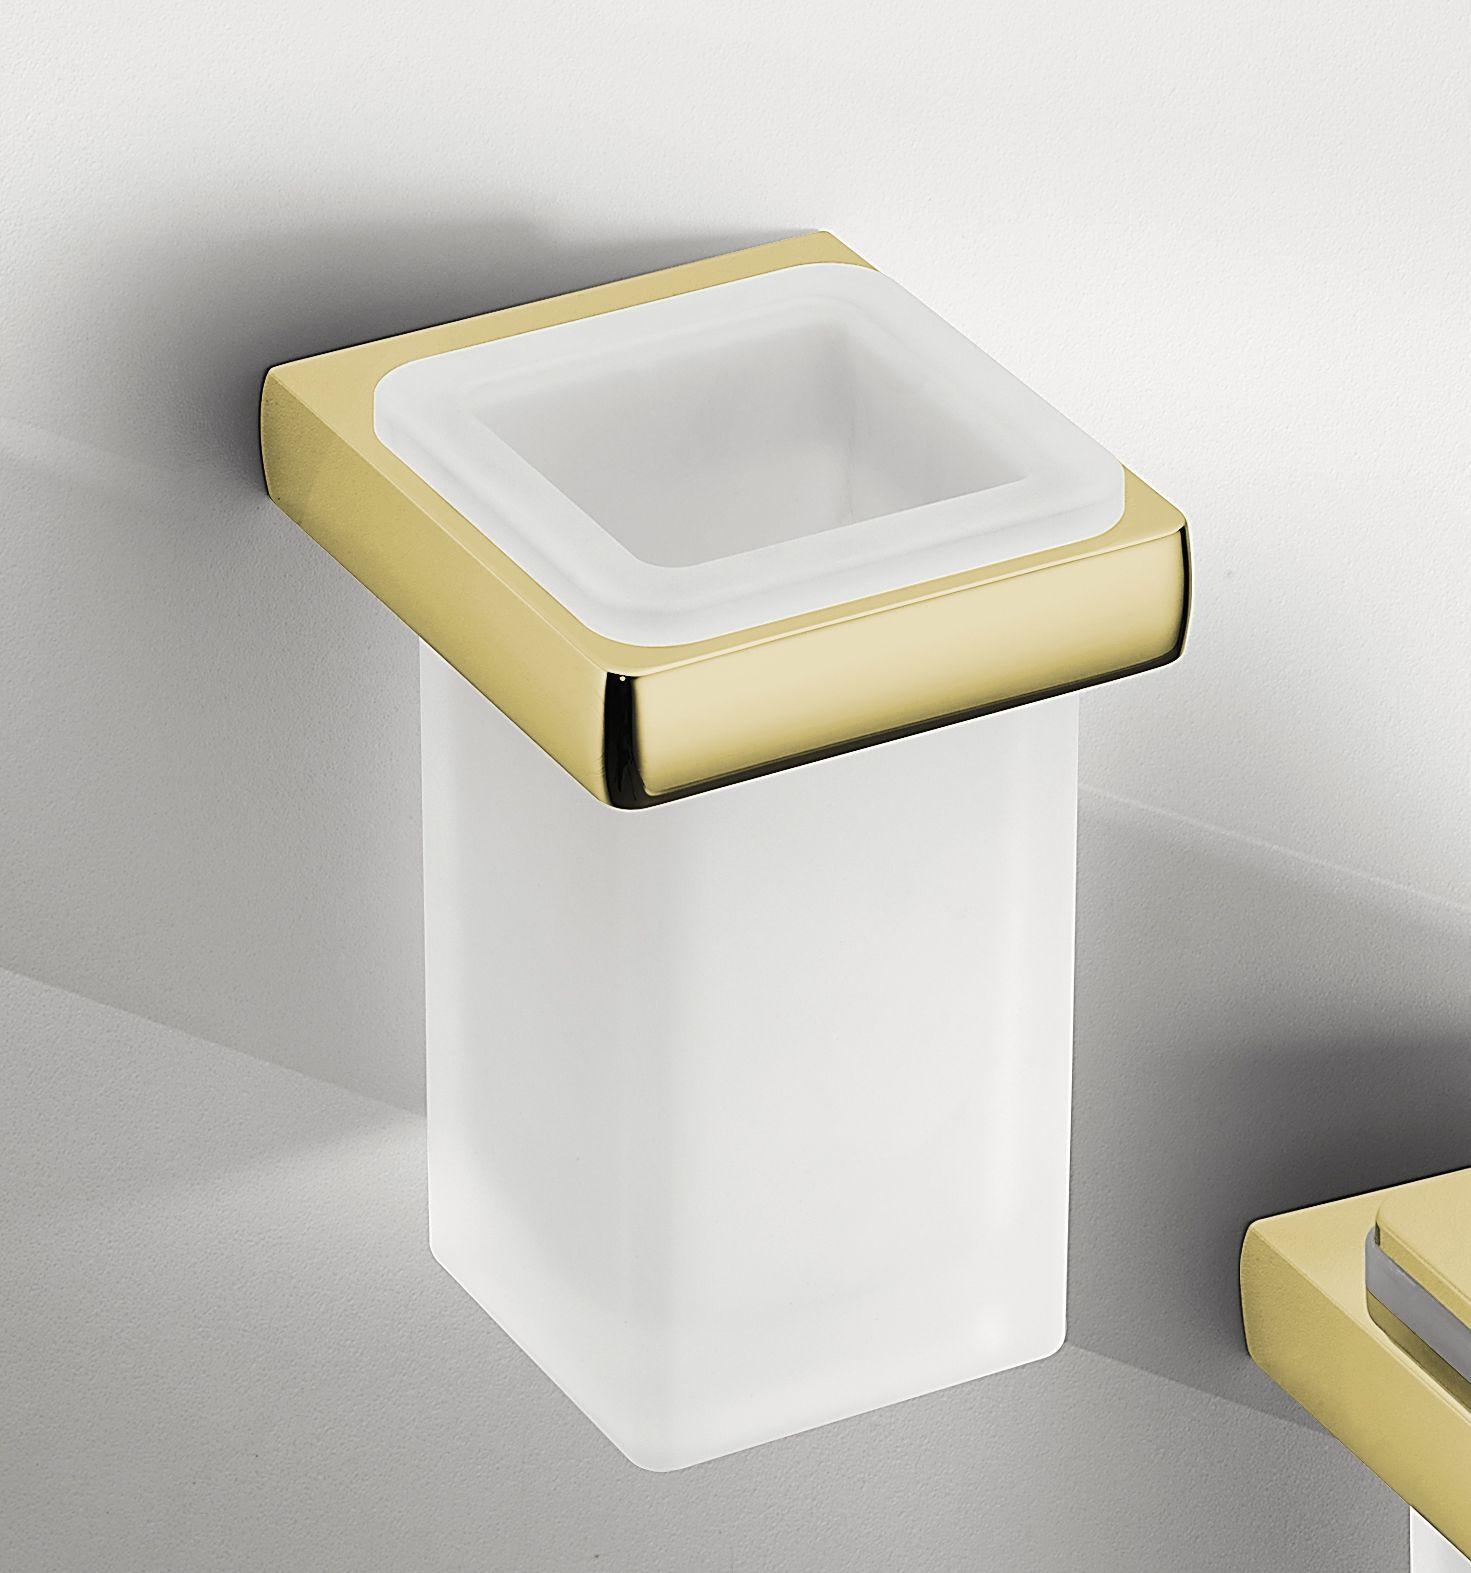 Gold Toothbrush Holder | Bathroom Accessories | Pinterest ...